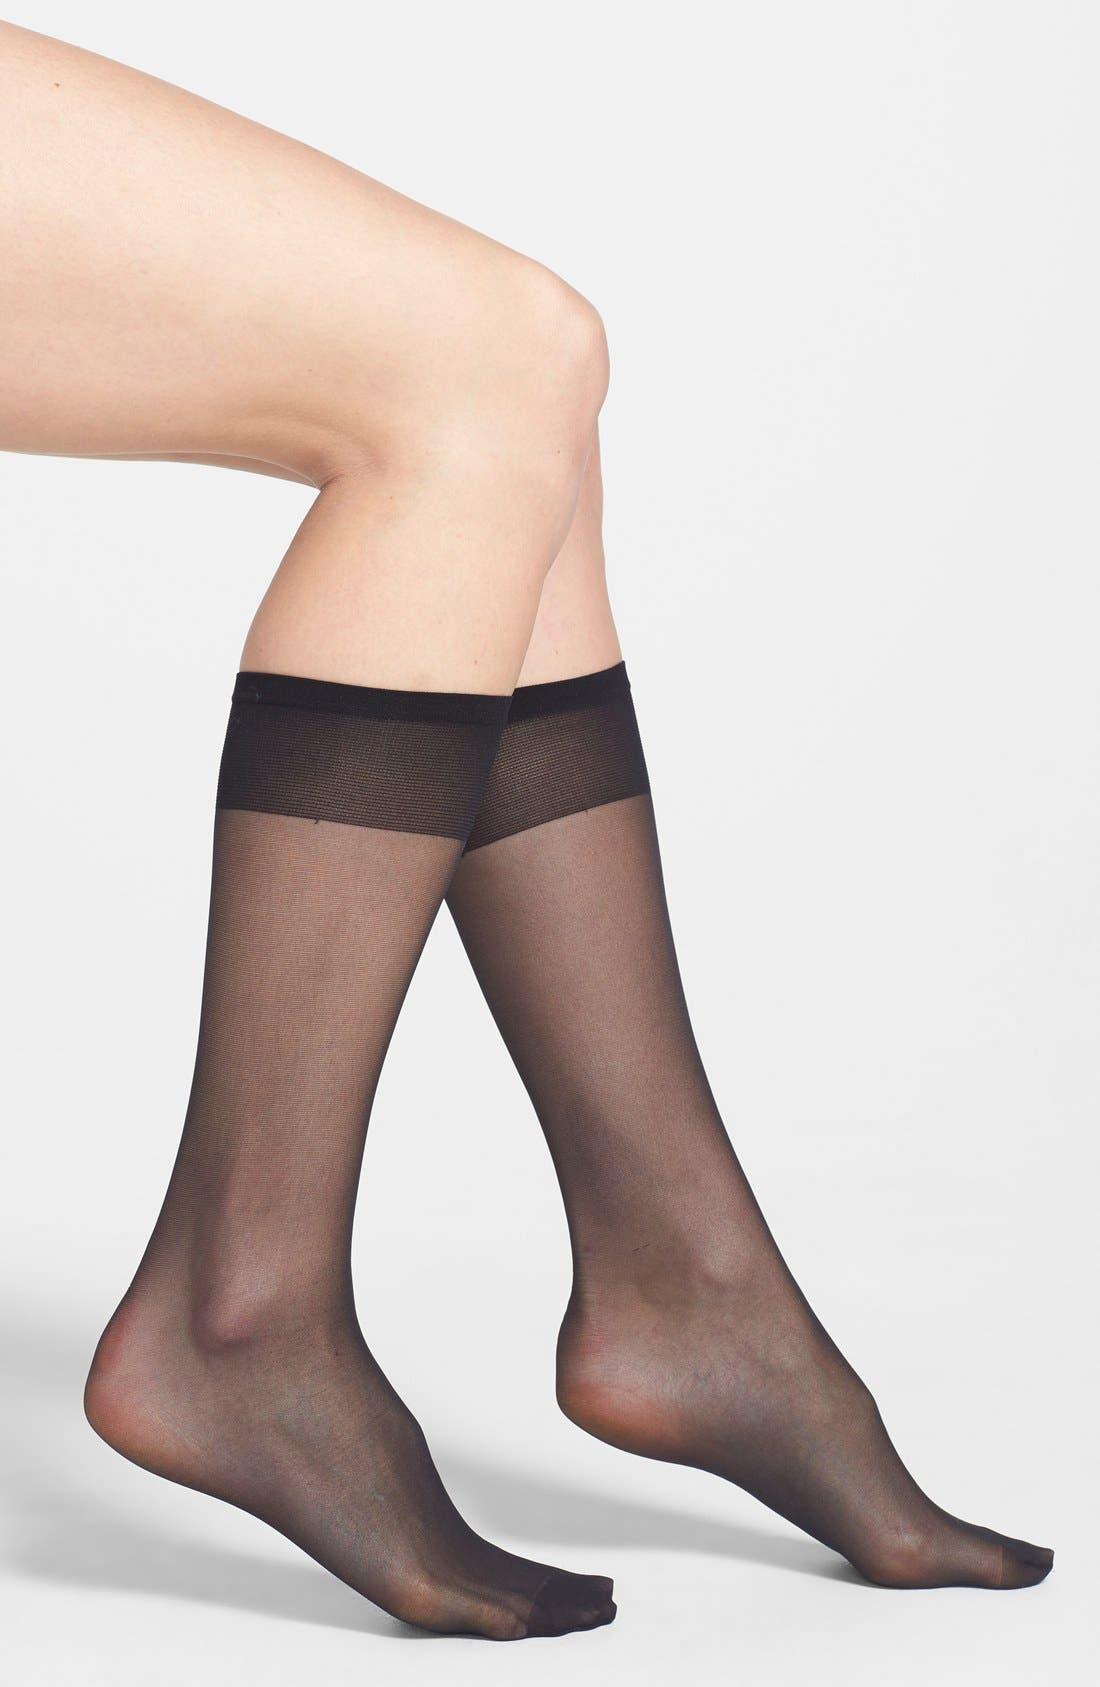 Alternate Image 1 Selected - Nordstrom 3-Pack Sheer Knee Highs (3 for $36)